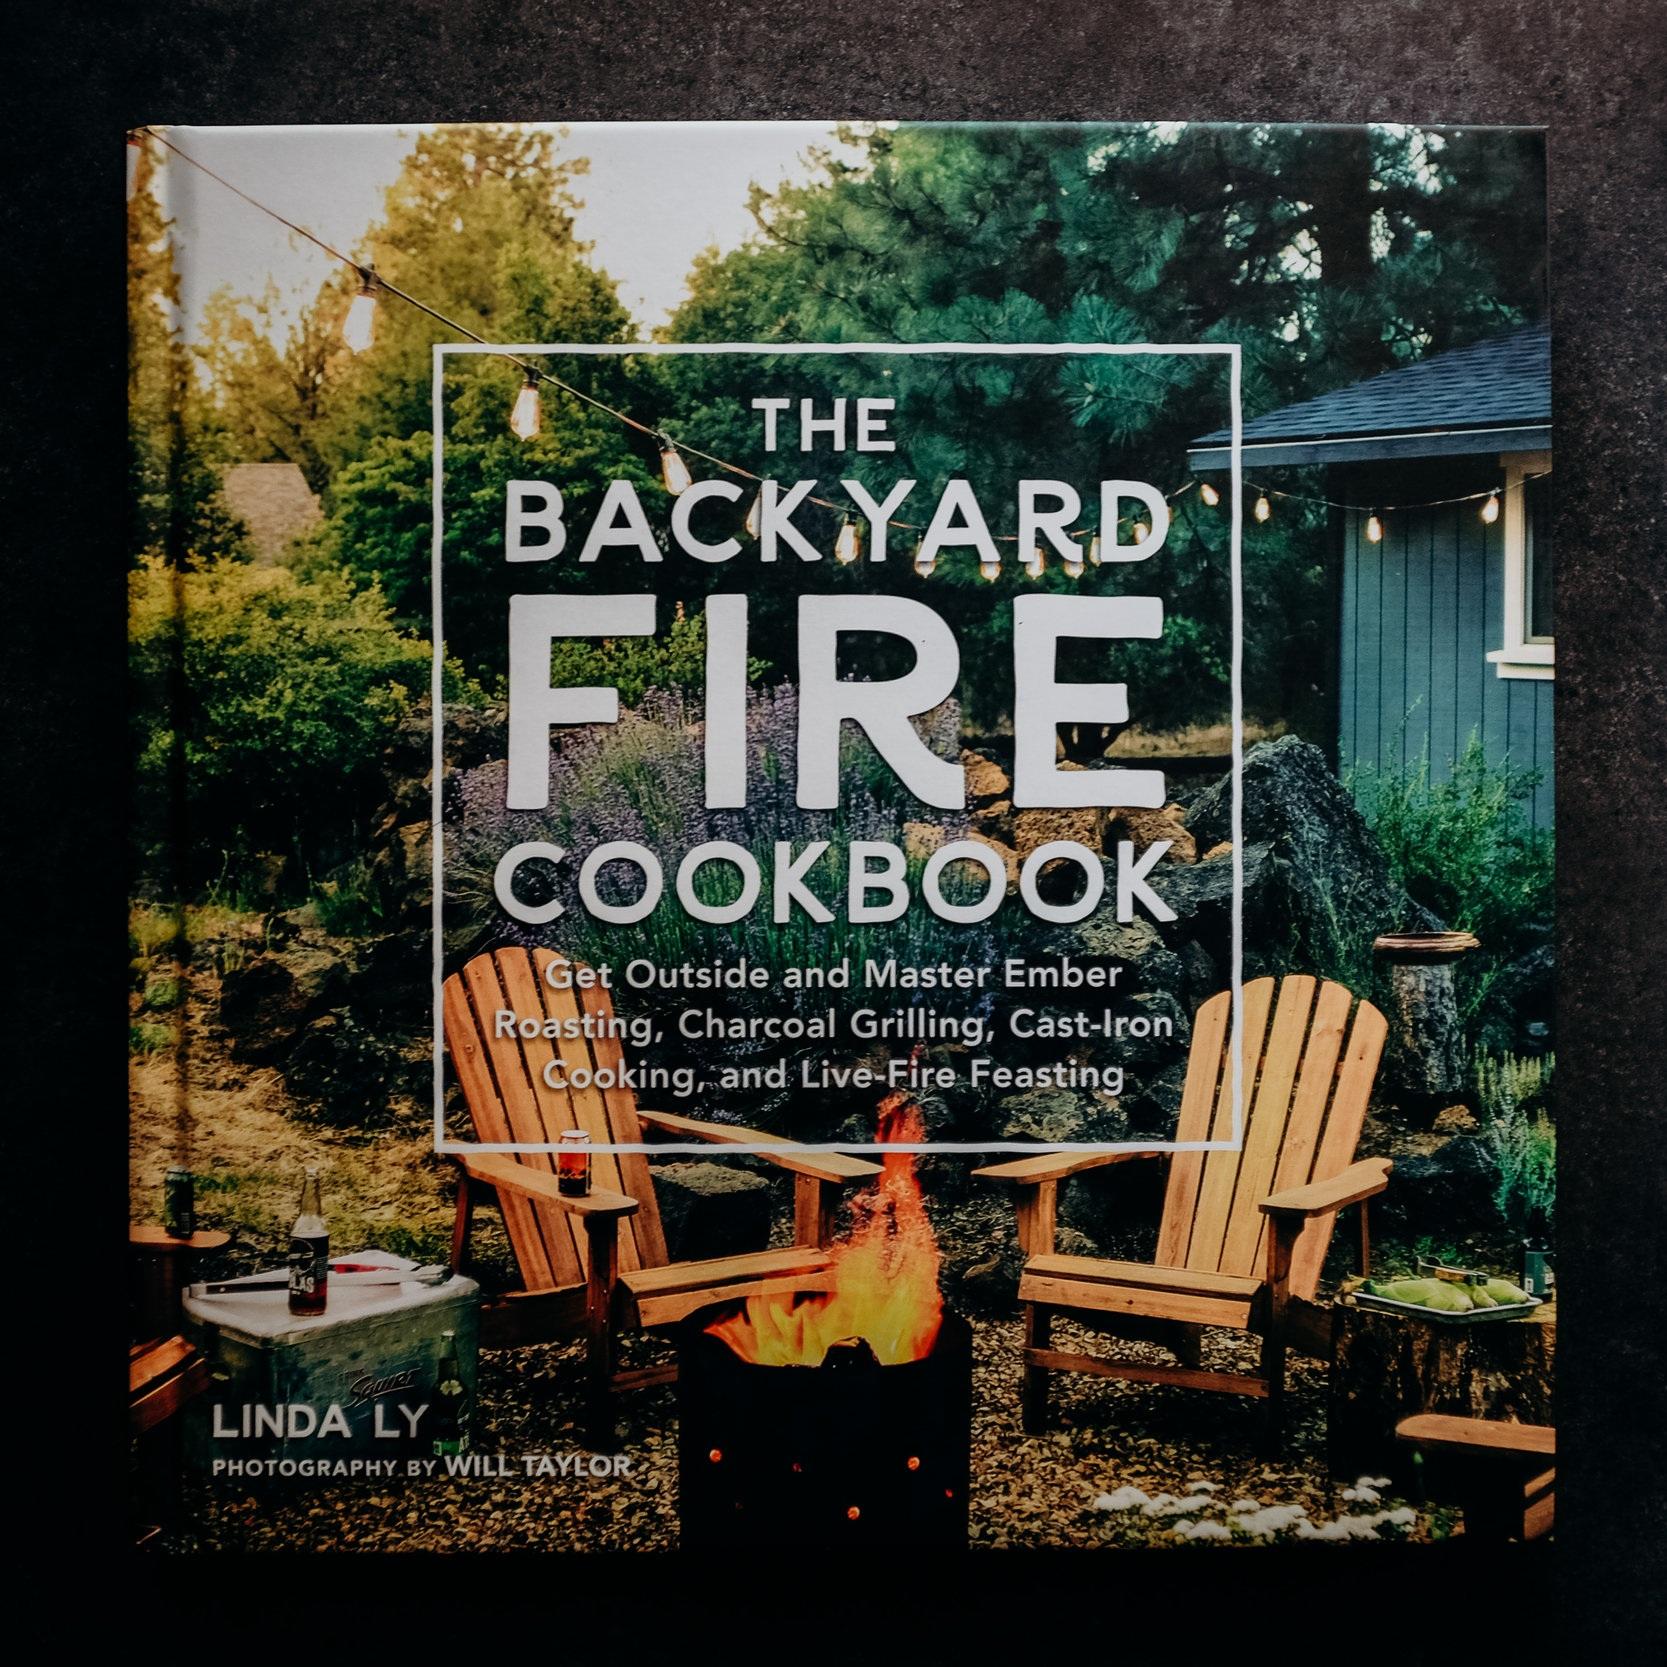 Winter+Cookbooks+%2817+of+37%29.jpg